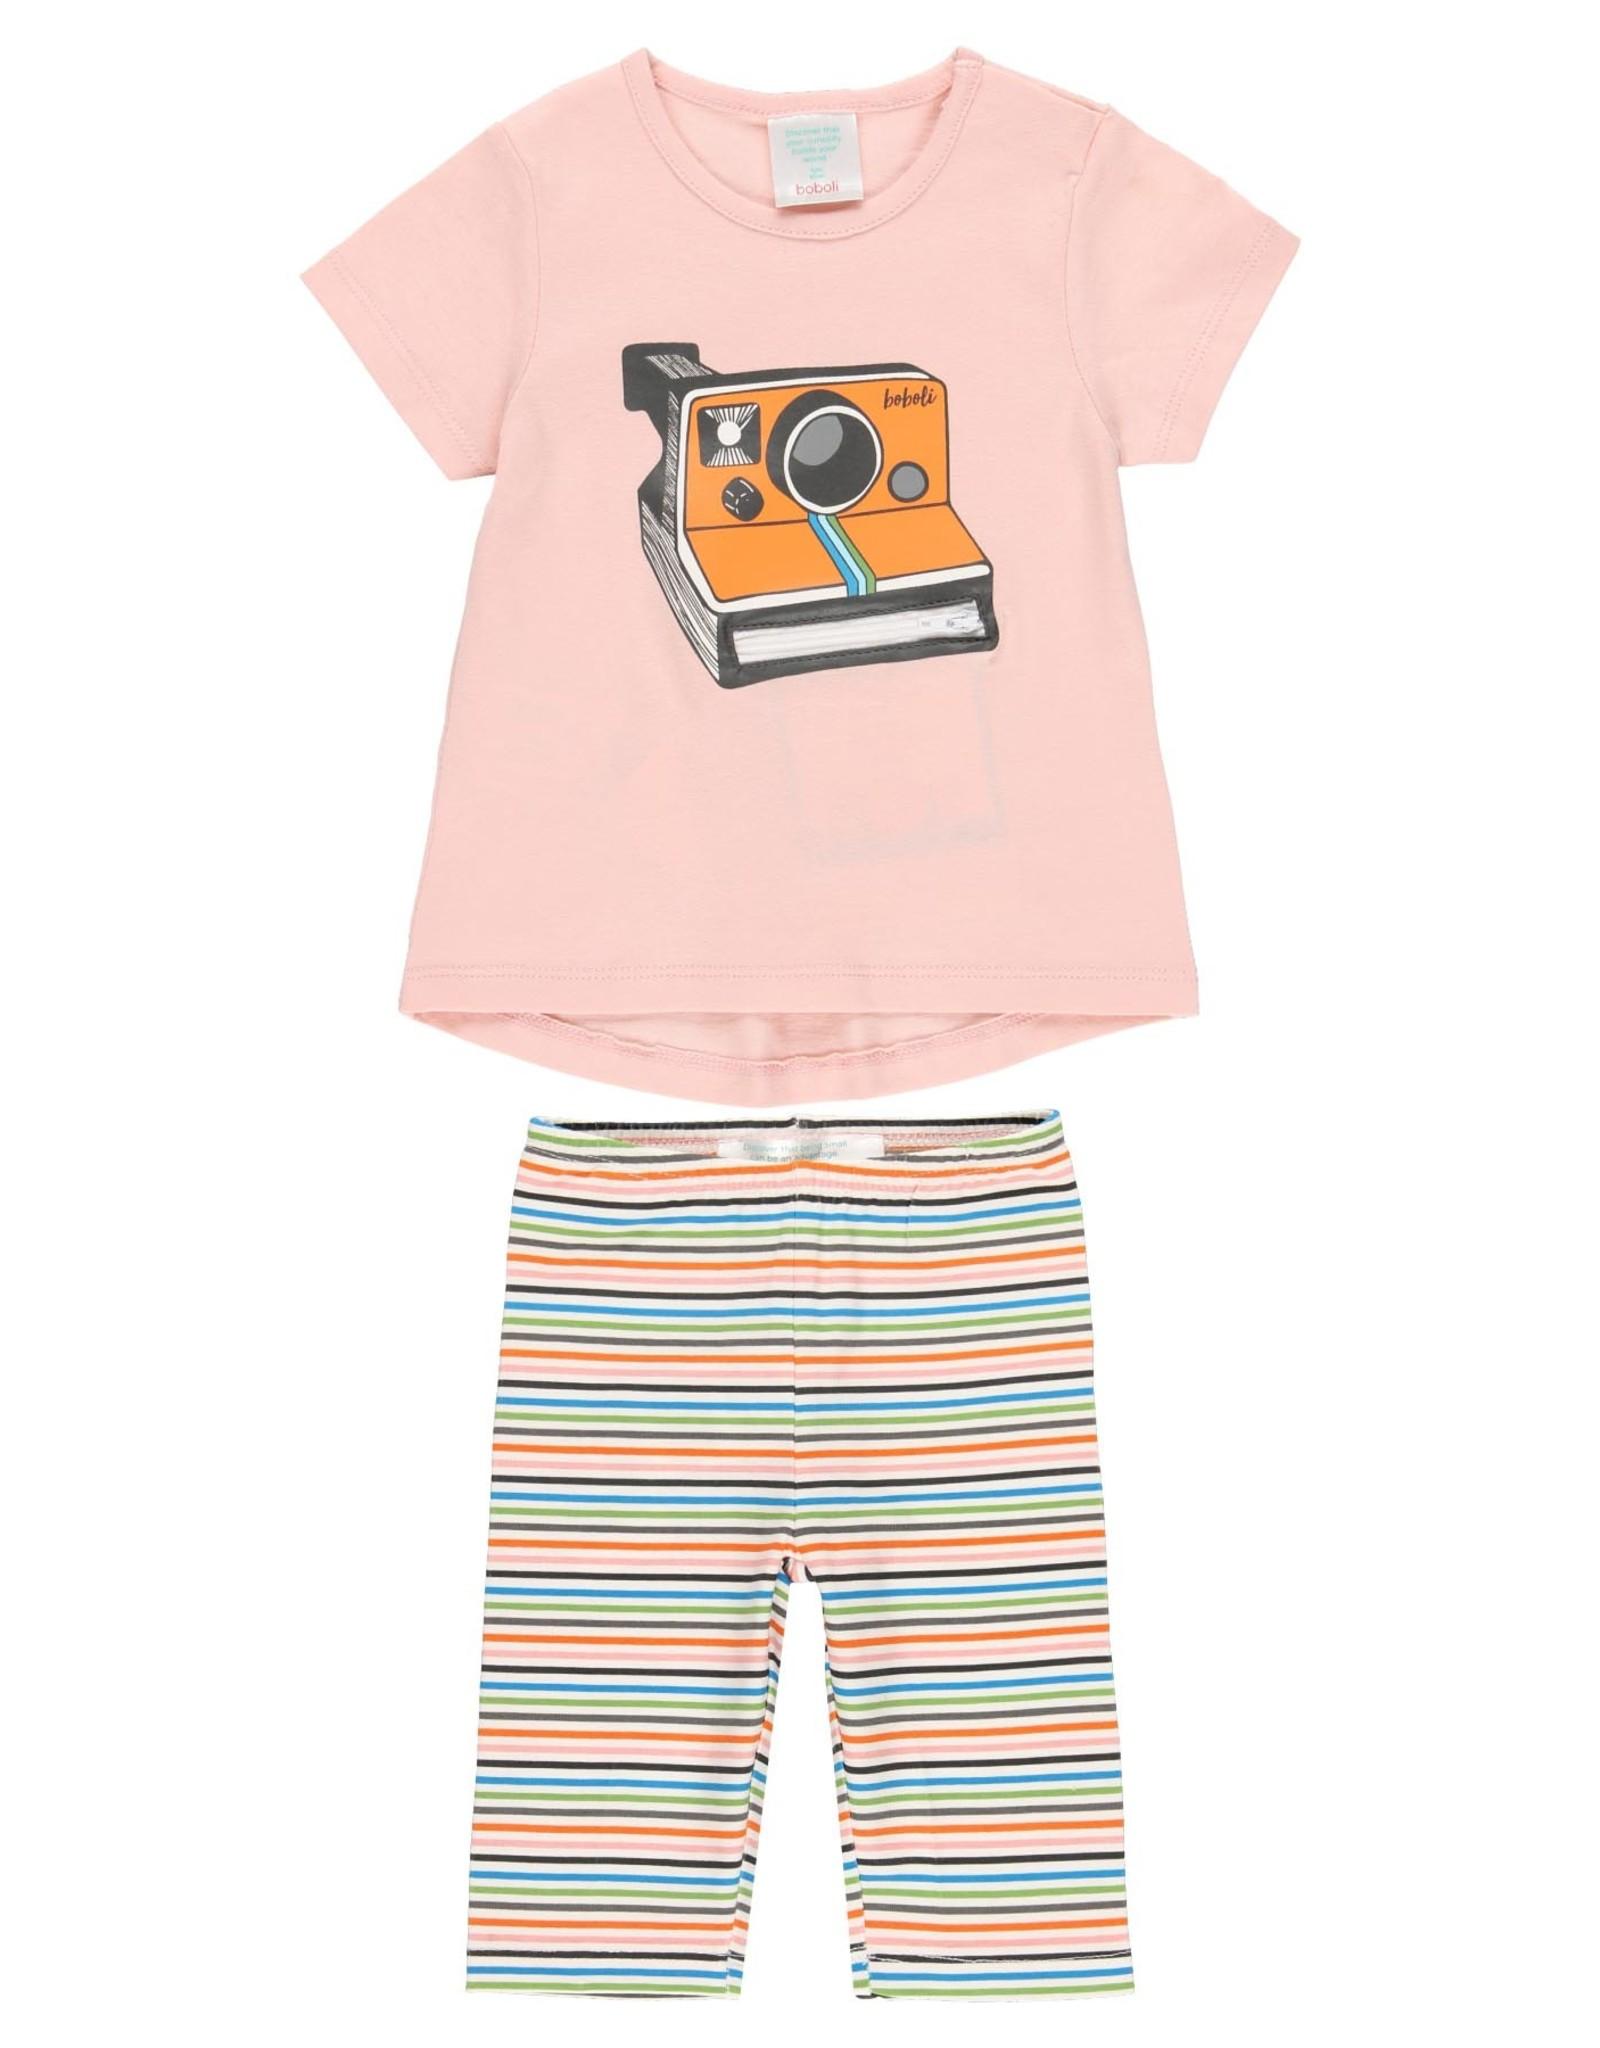 Boboli Shirt and Leggings Set, Camera